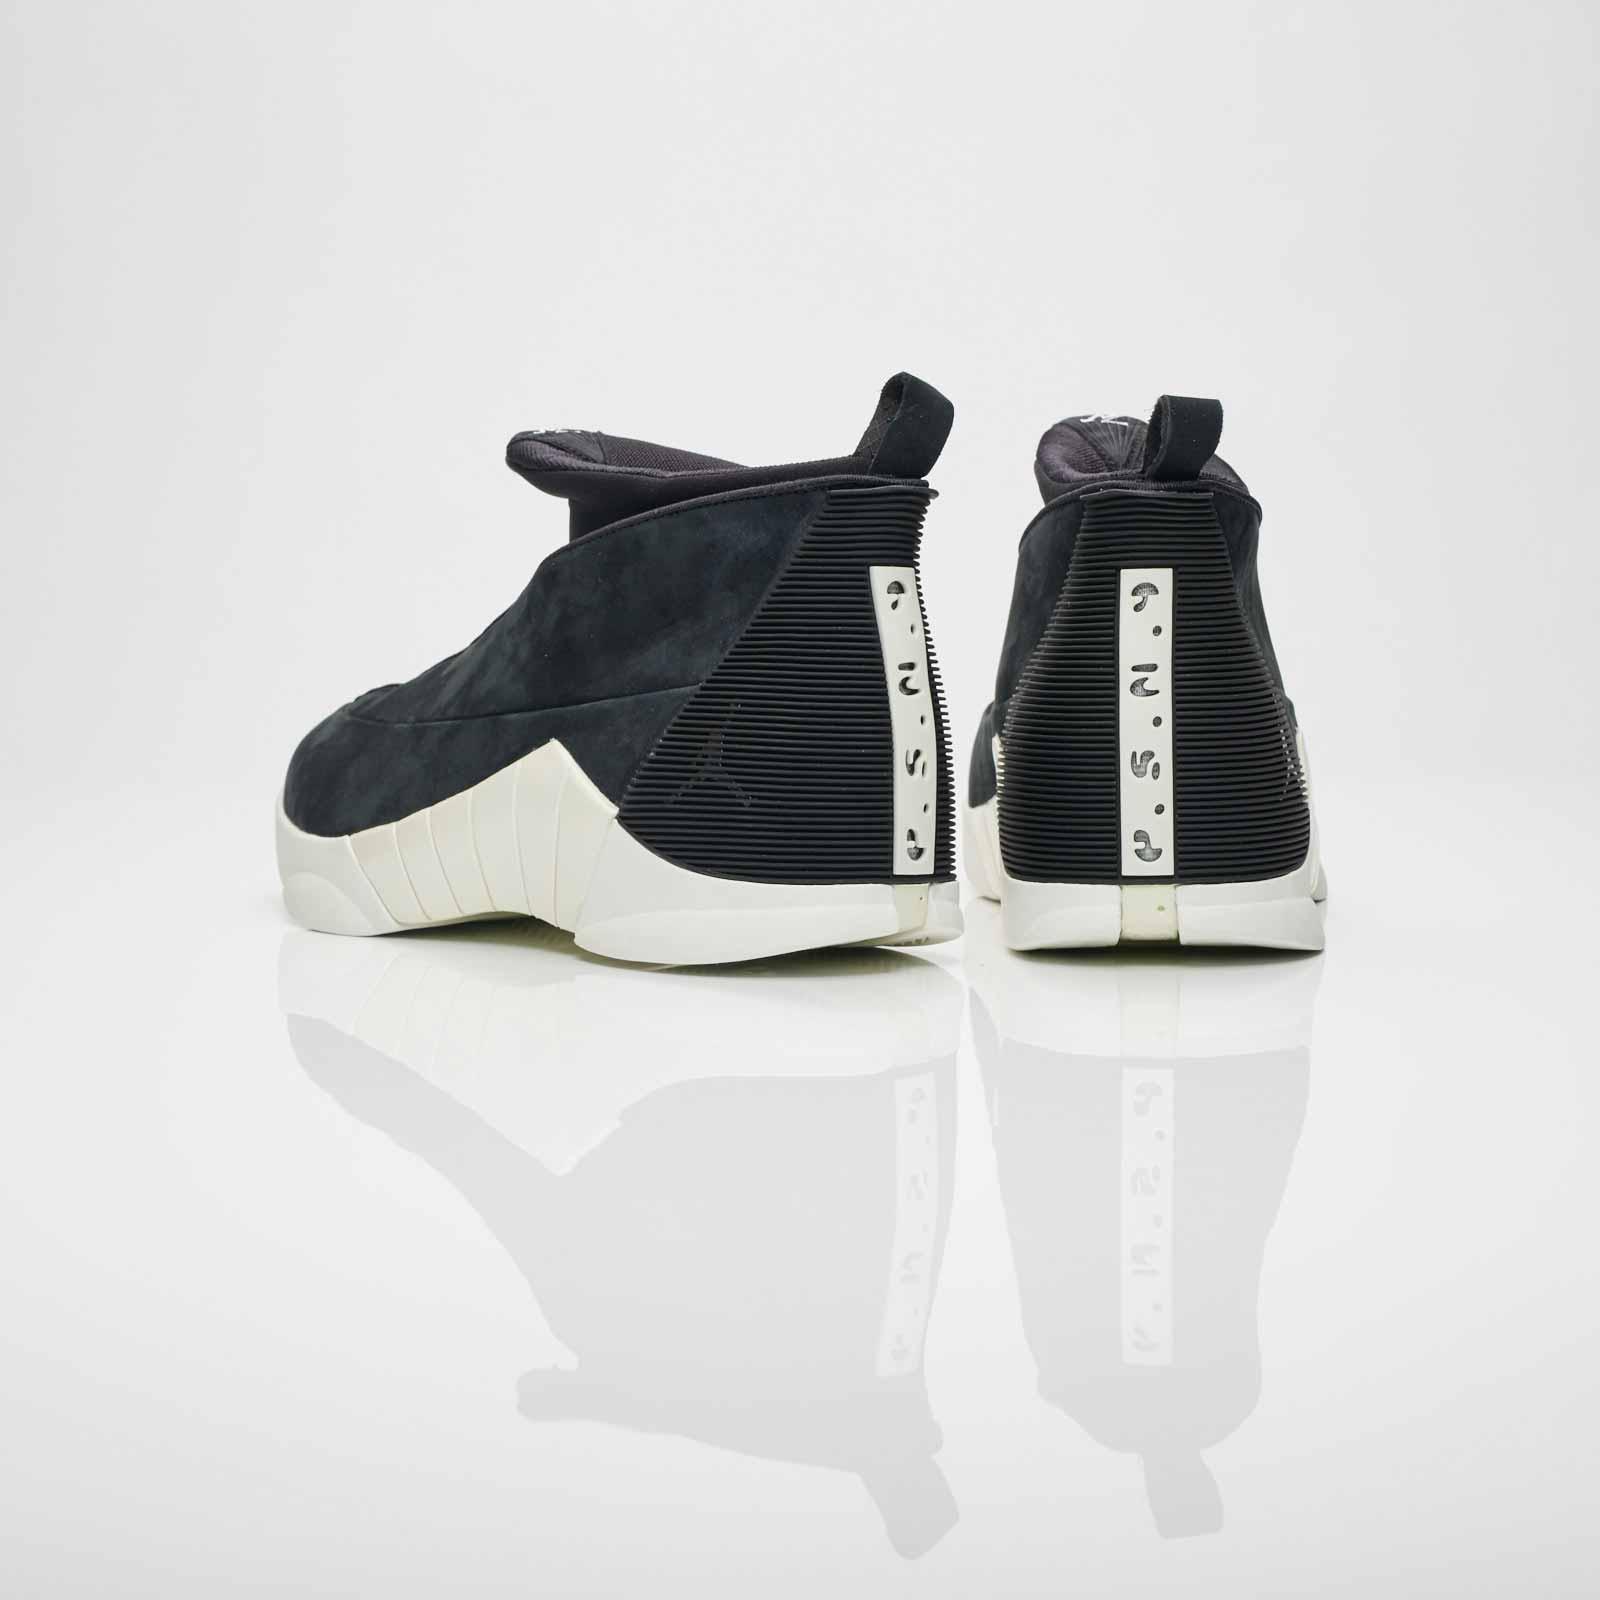 50f71b2e1de403 Jordan Brand Air Jordan 15 Retro x PSNY - 921194-011 - Sneakersnstuff